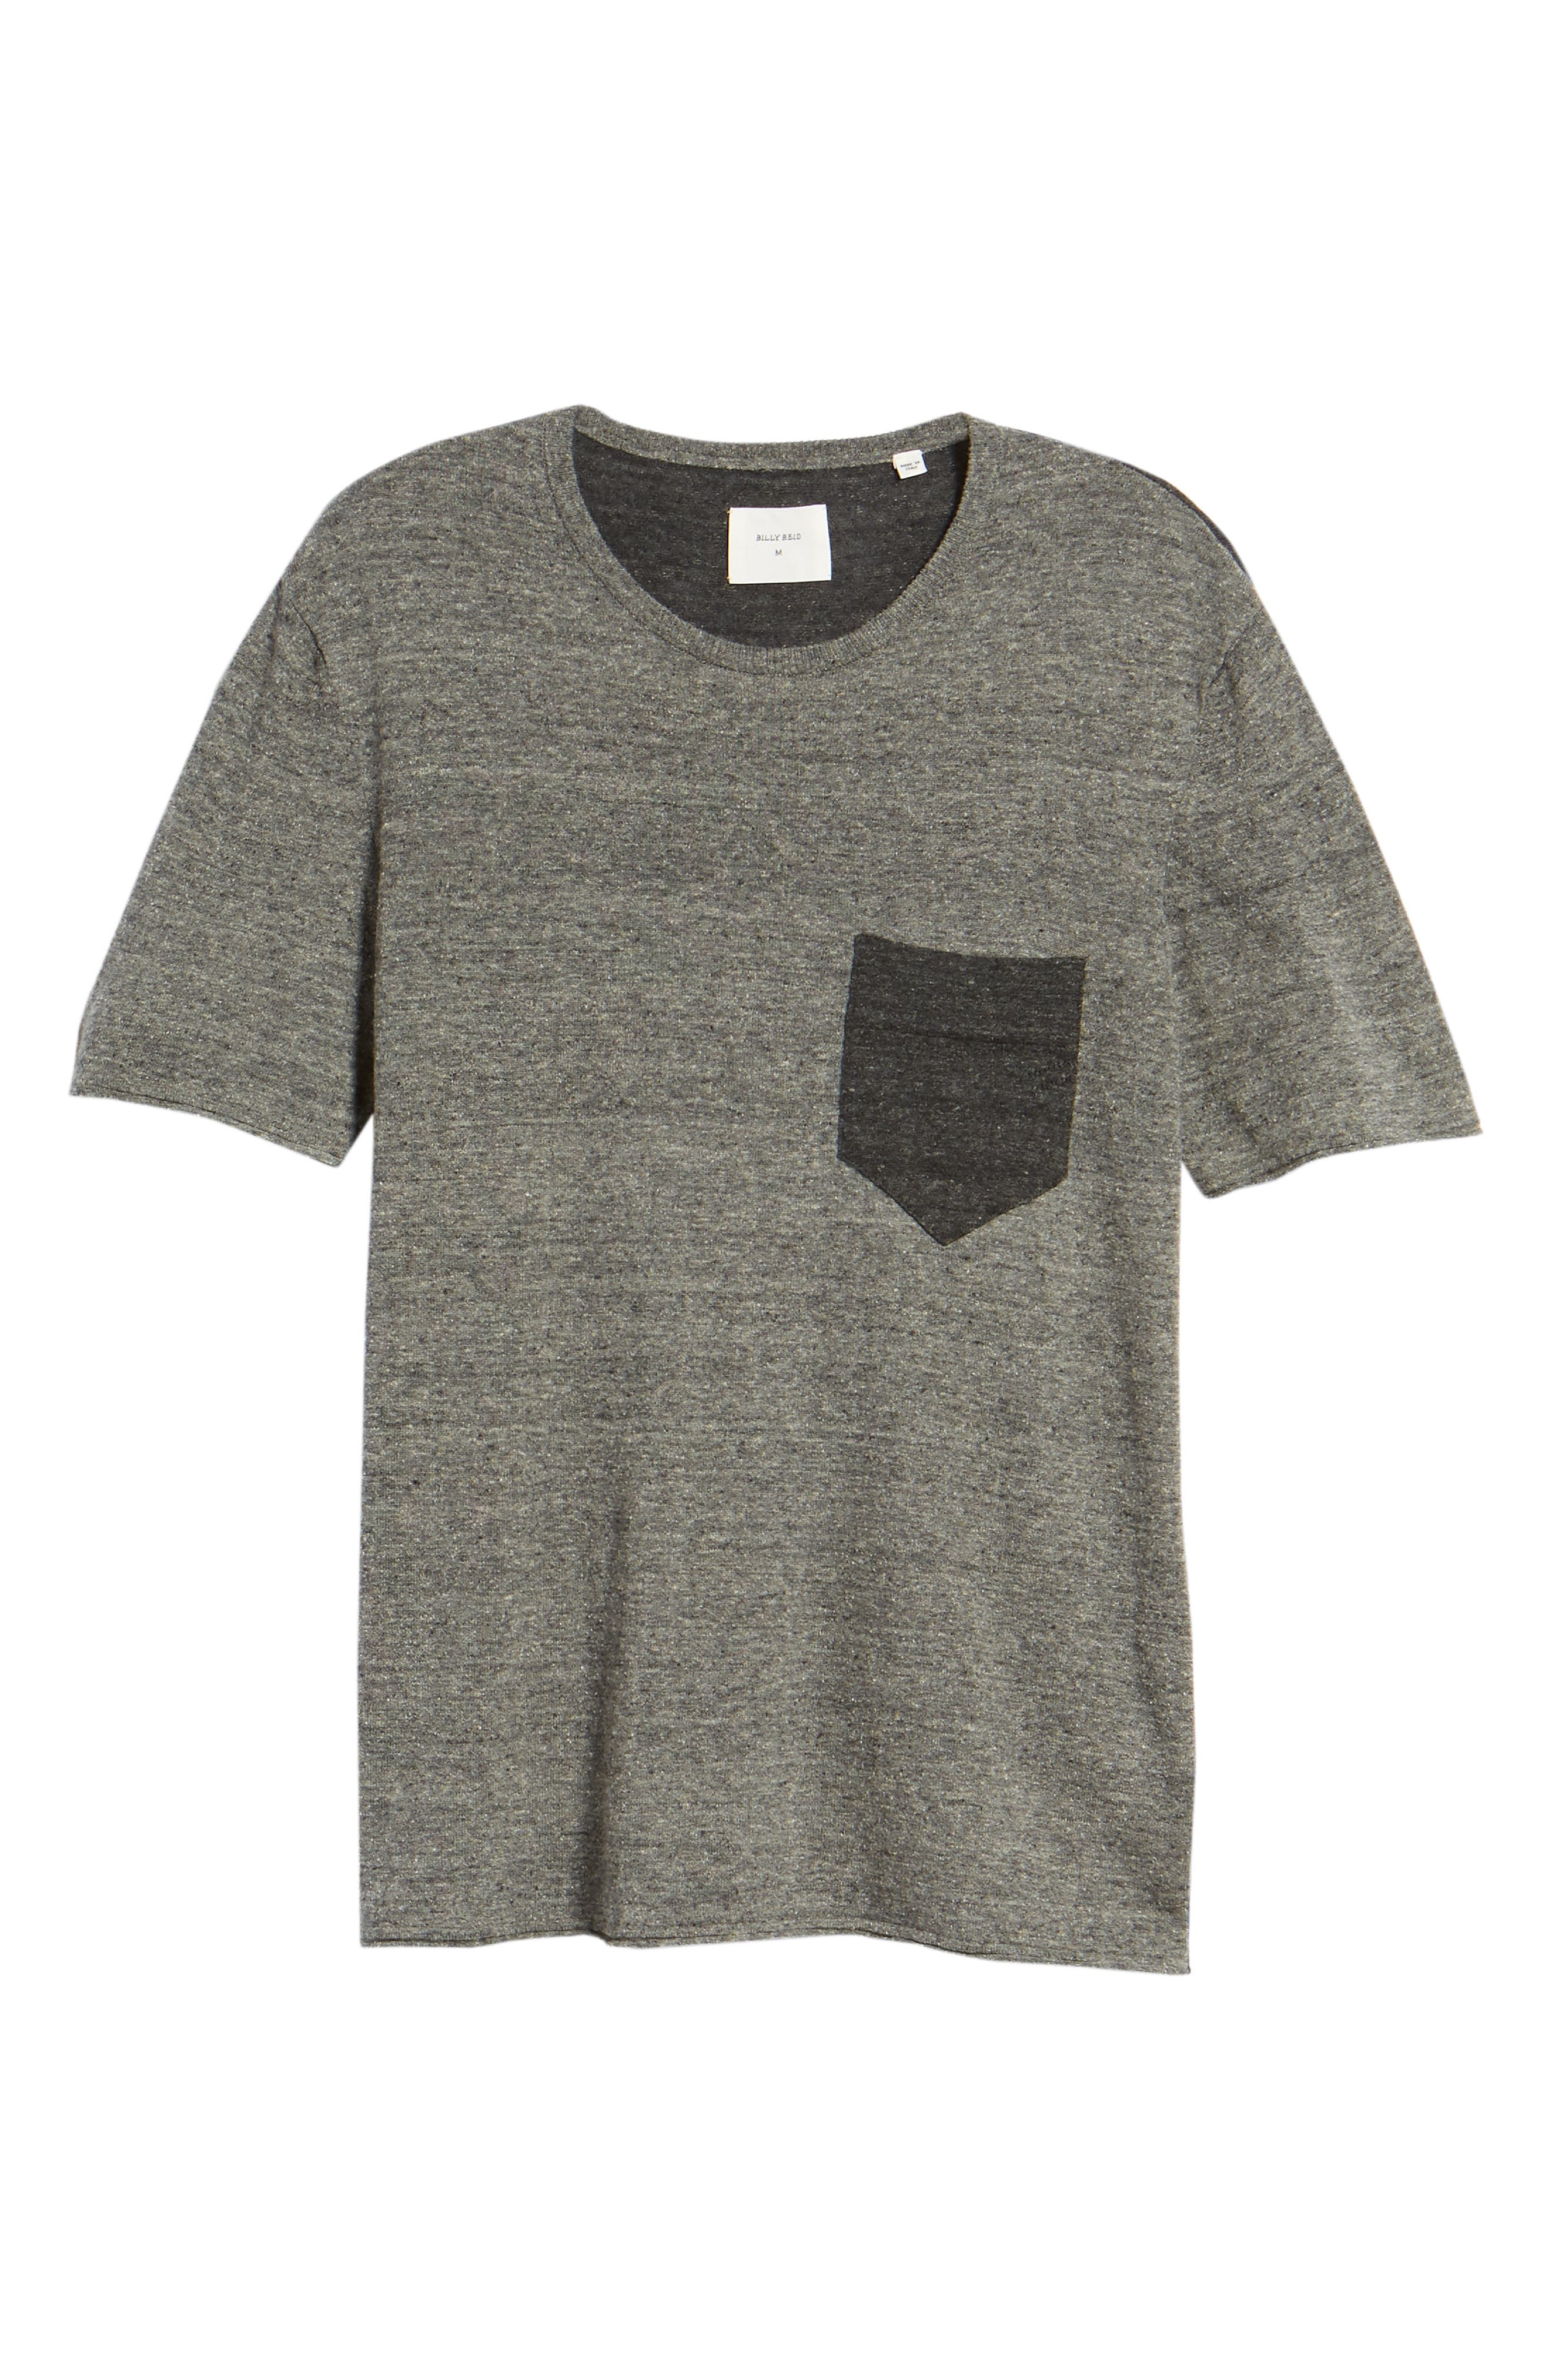 Two-Tone Crewneck T-Shirt,                             Alternate thumbnail 6, color,                             060